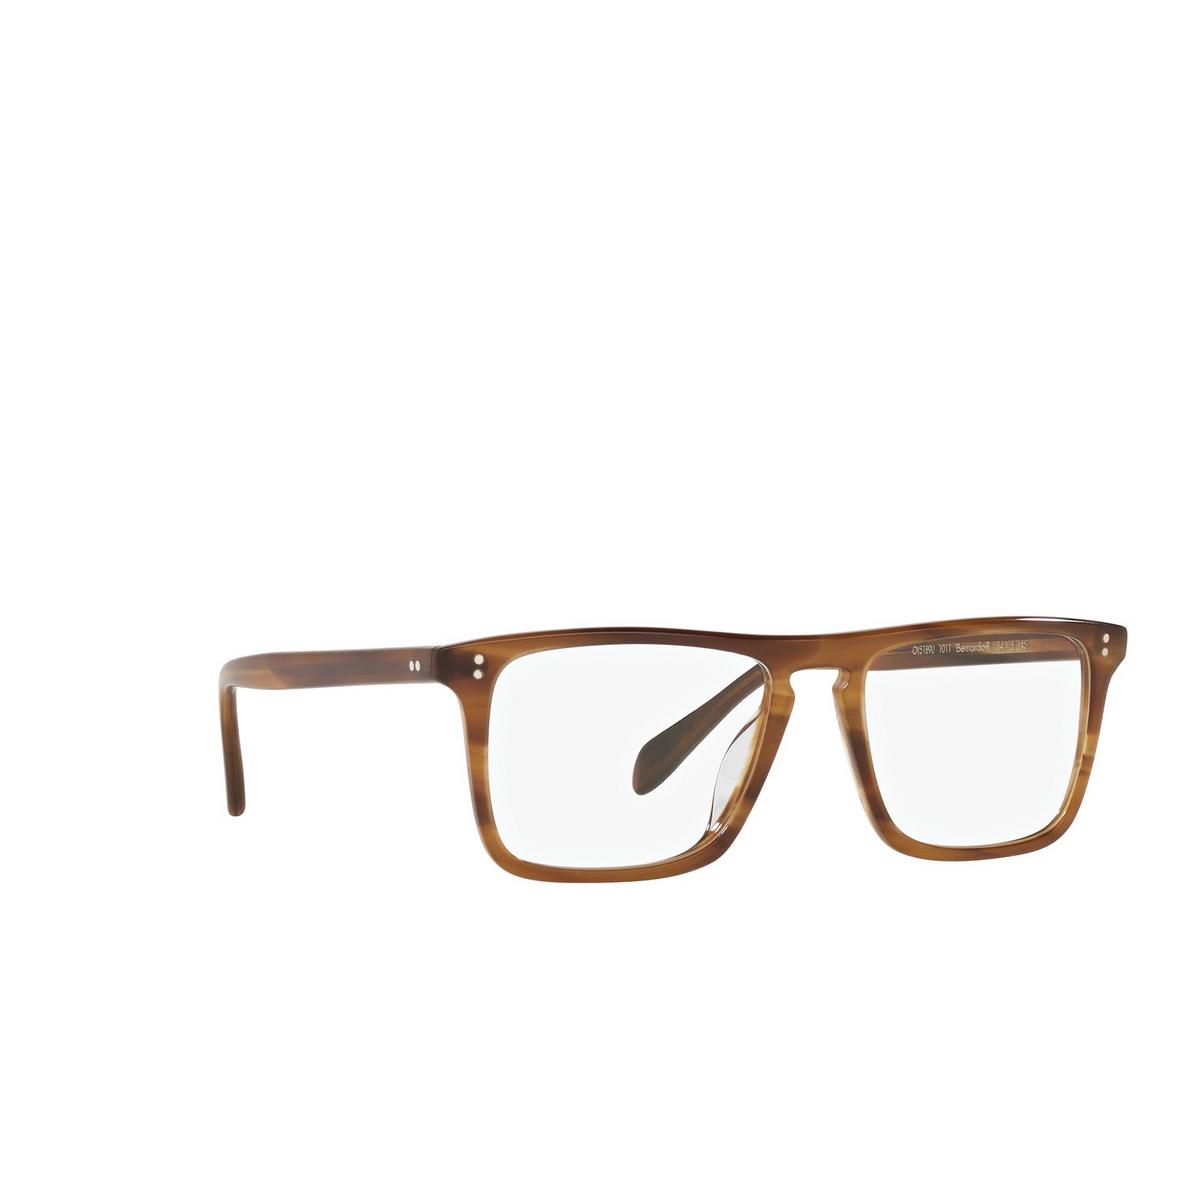 Oliver Peoples® Square Eyeglasses: Bernardo-r OV5189U color Raintree 1011 - three-quarters view.